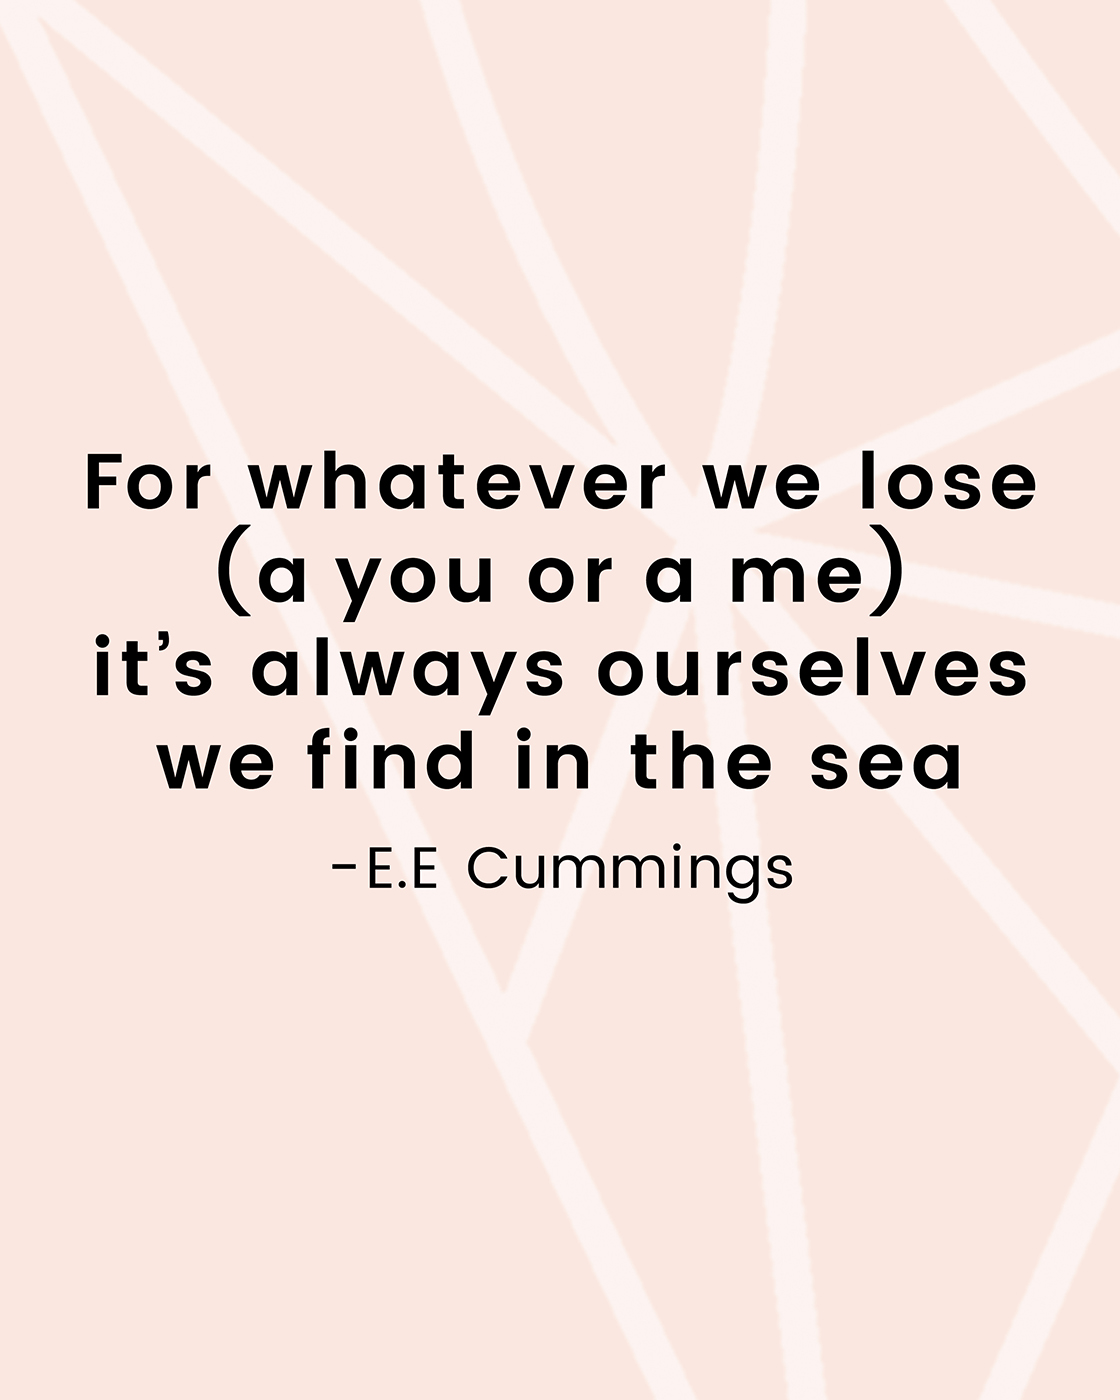 E.E Cummings.jpg